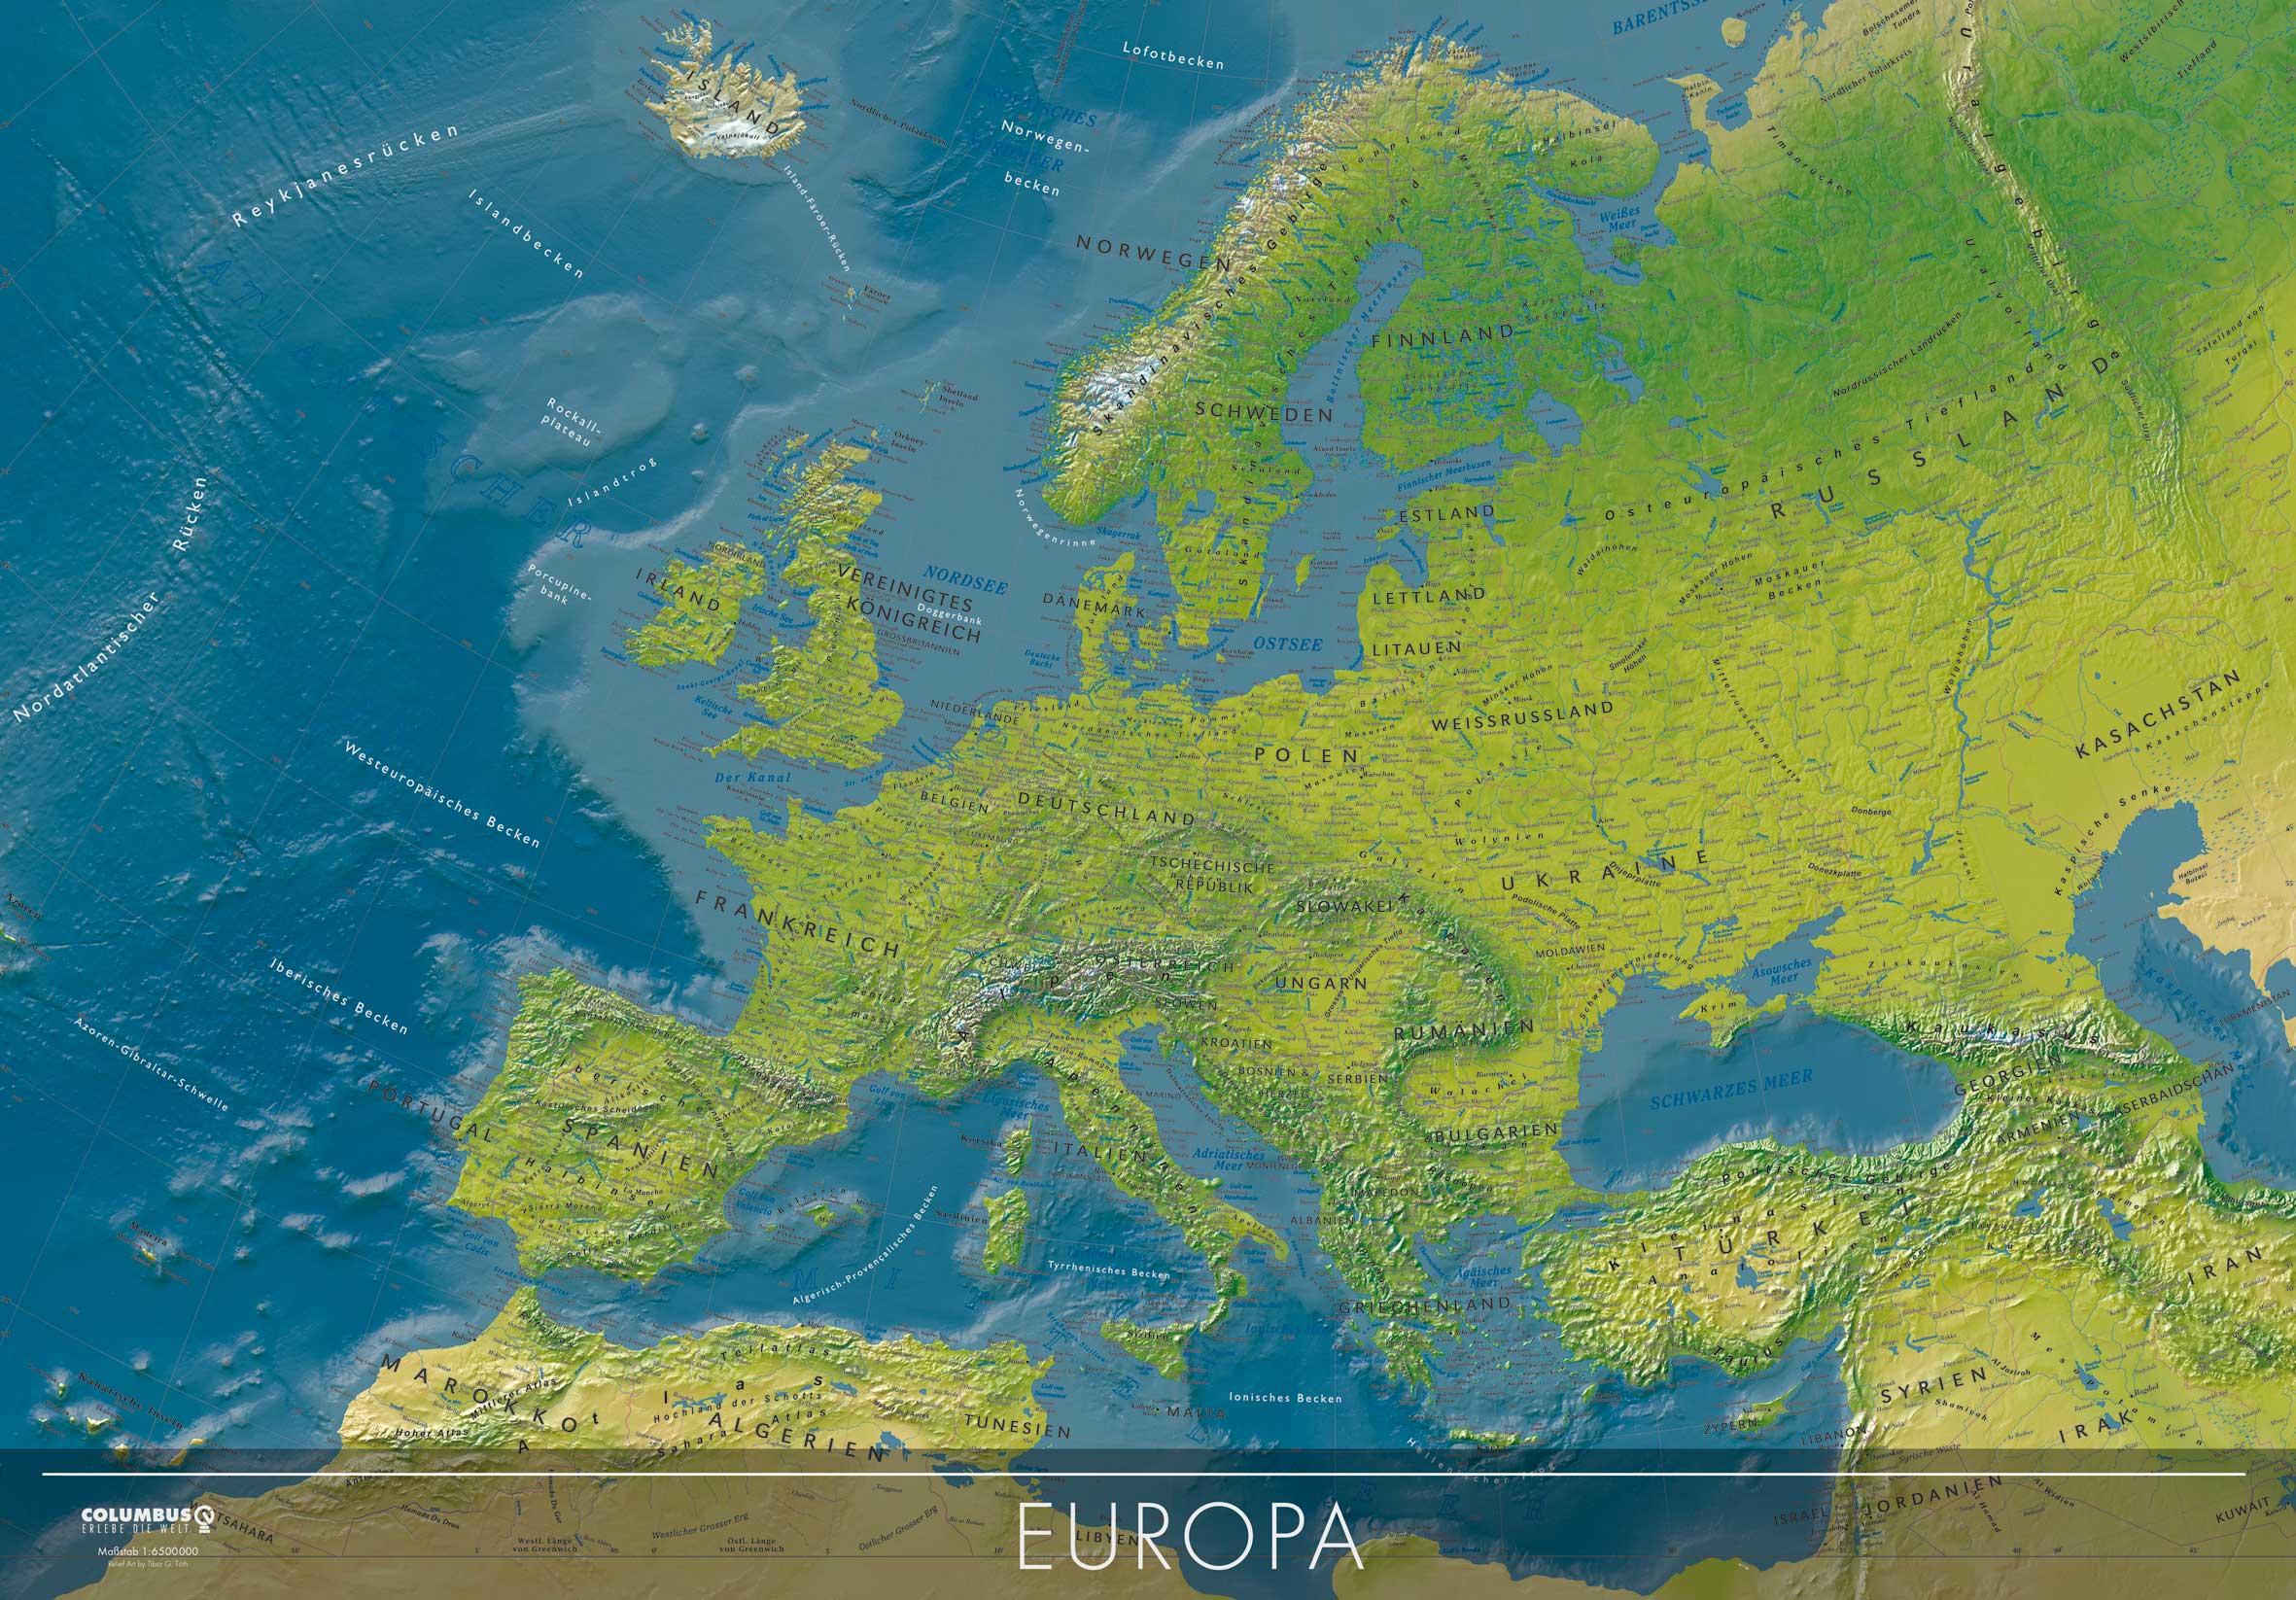 Karte Von Europa.Europa Karte Oder Europa Karte Oder Europa Landkarte